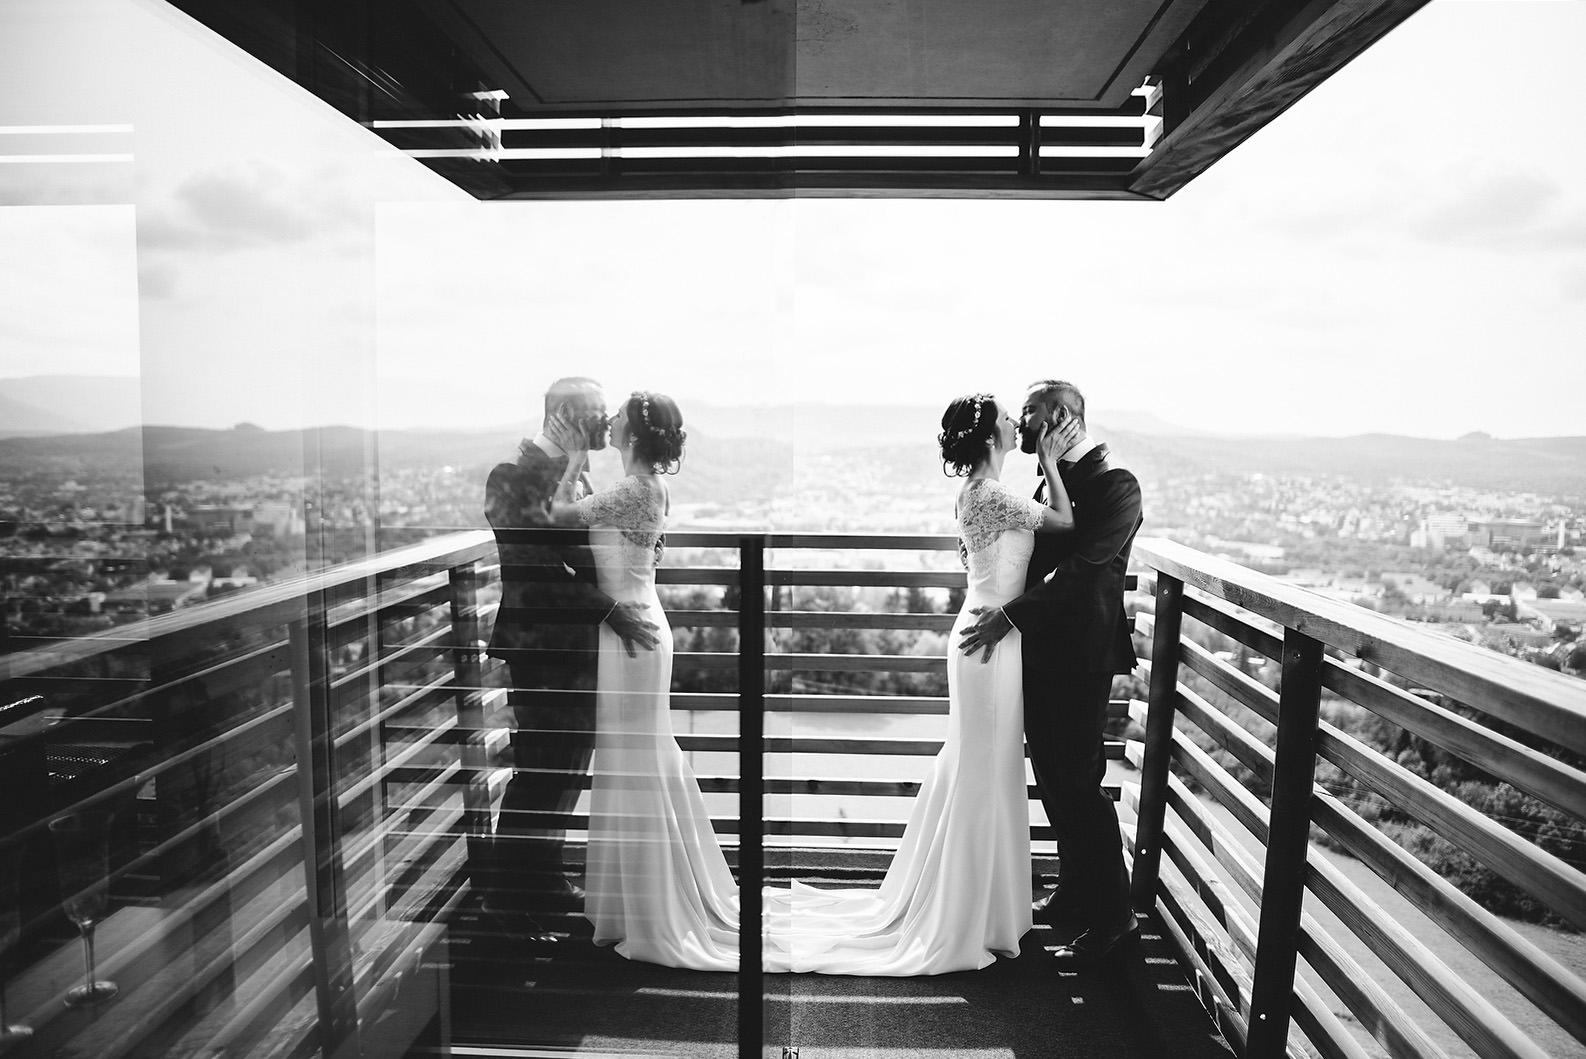 Fotograf Konstanz - Hochzeitsfotograf Reutlingen Achalm Hochzeit EFP 21 - Als Hochzeitsfotograf auf der Achalm, Reutlingen  - 16 -